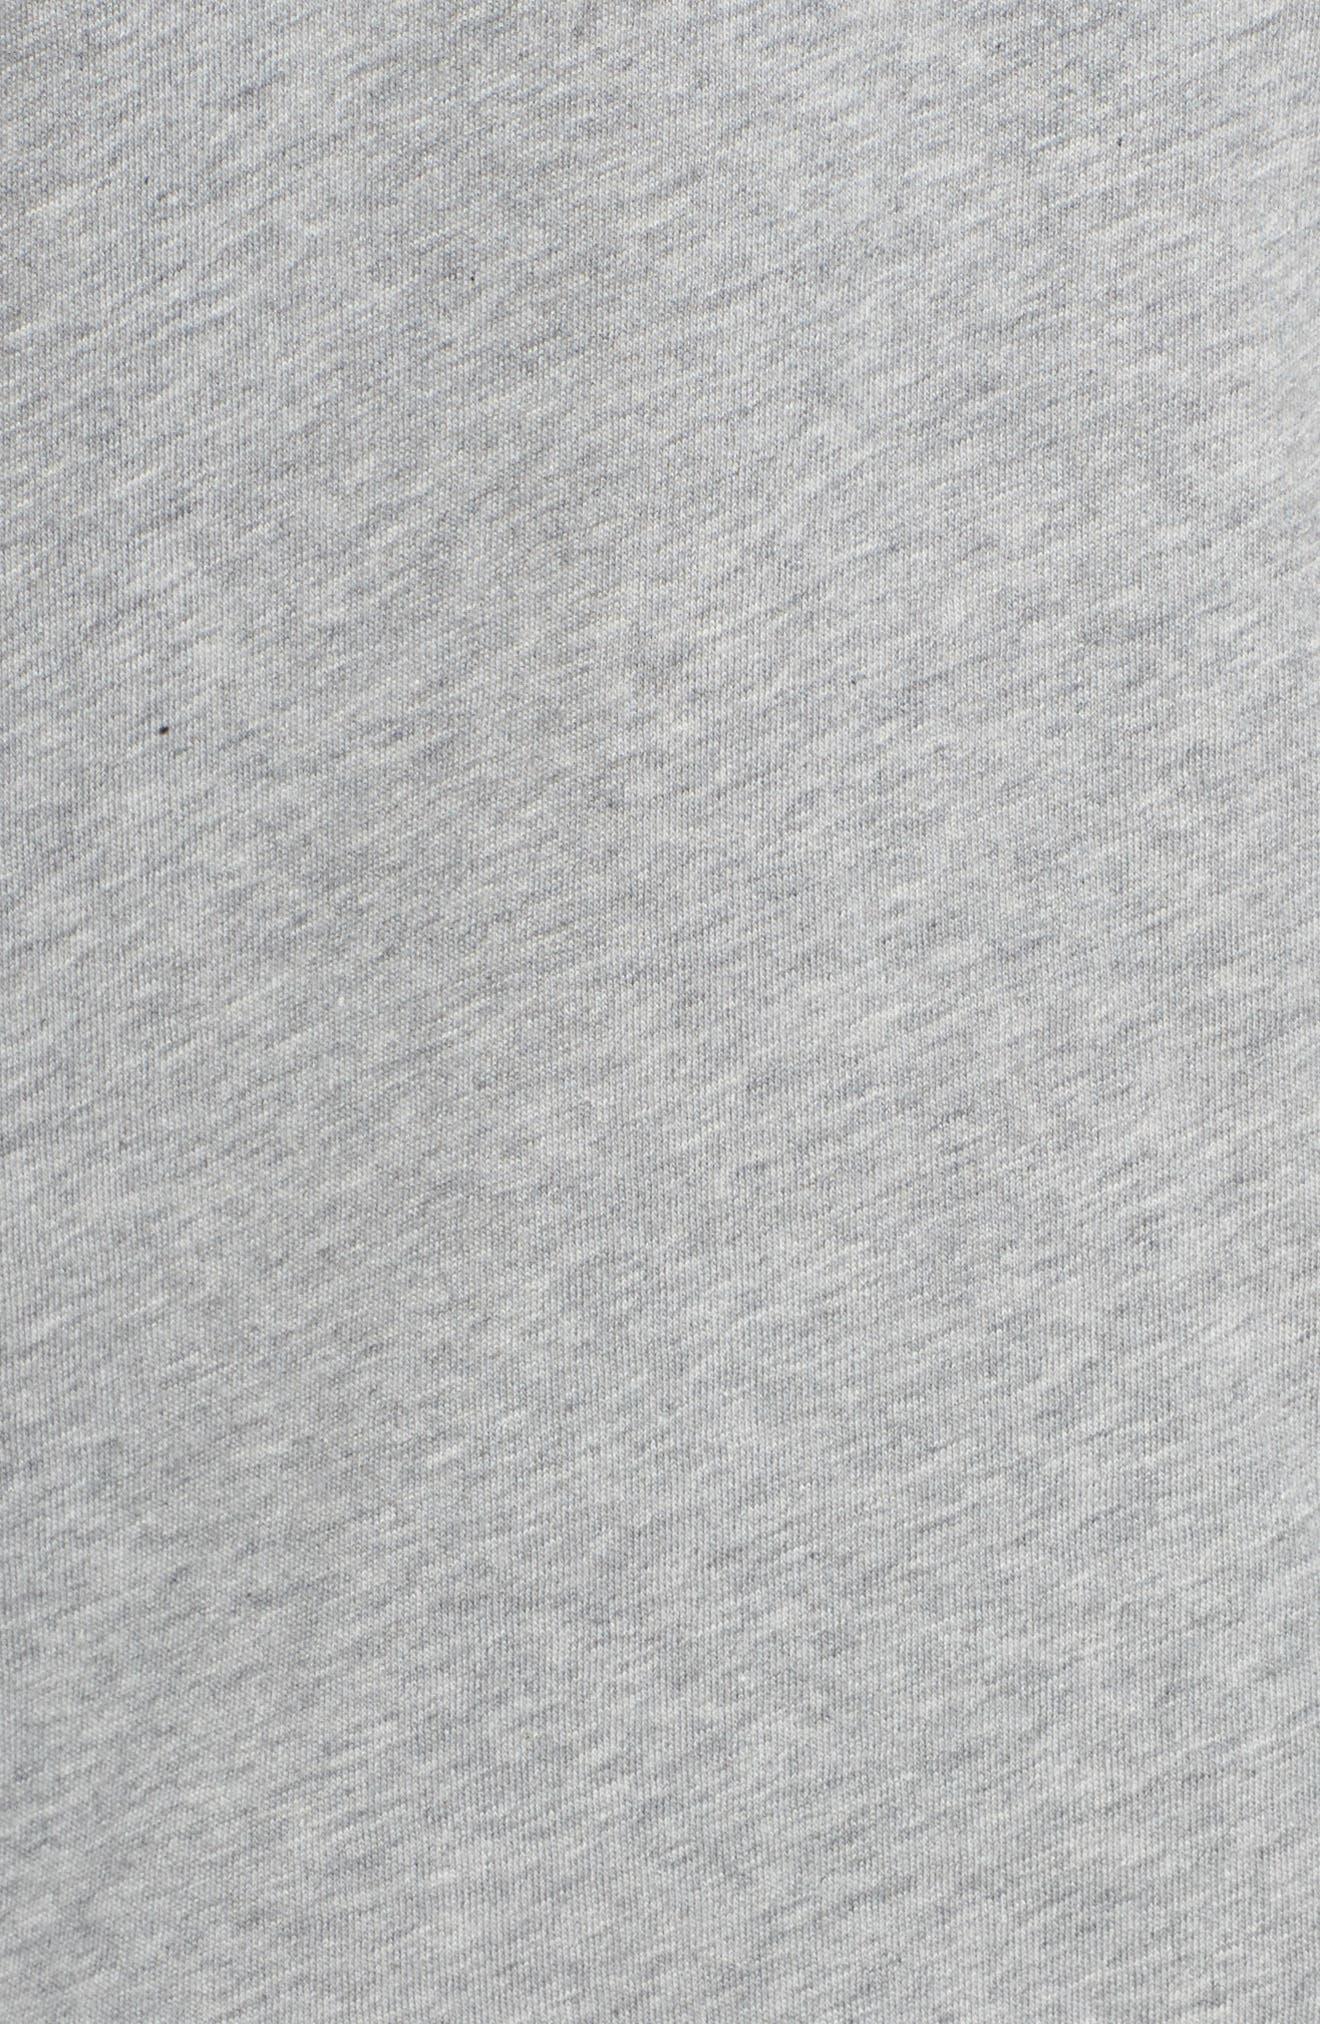 Sportswear Goddess Graphic Tee,                             Alternate thumbnail 6, color,                             Dark Grey Heather/ Black